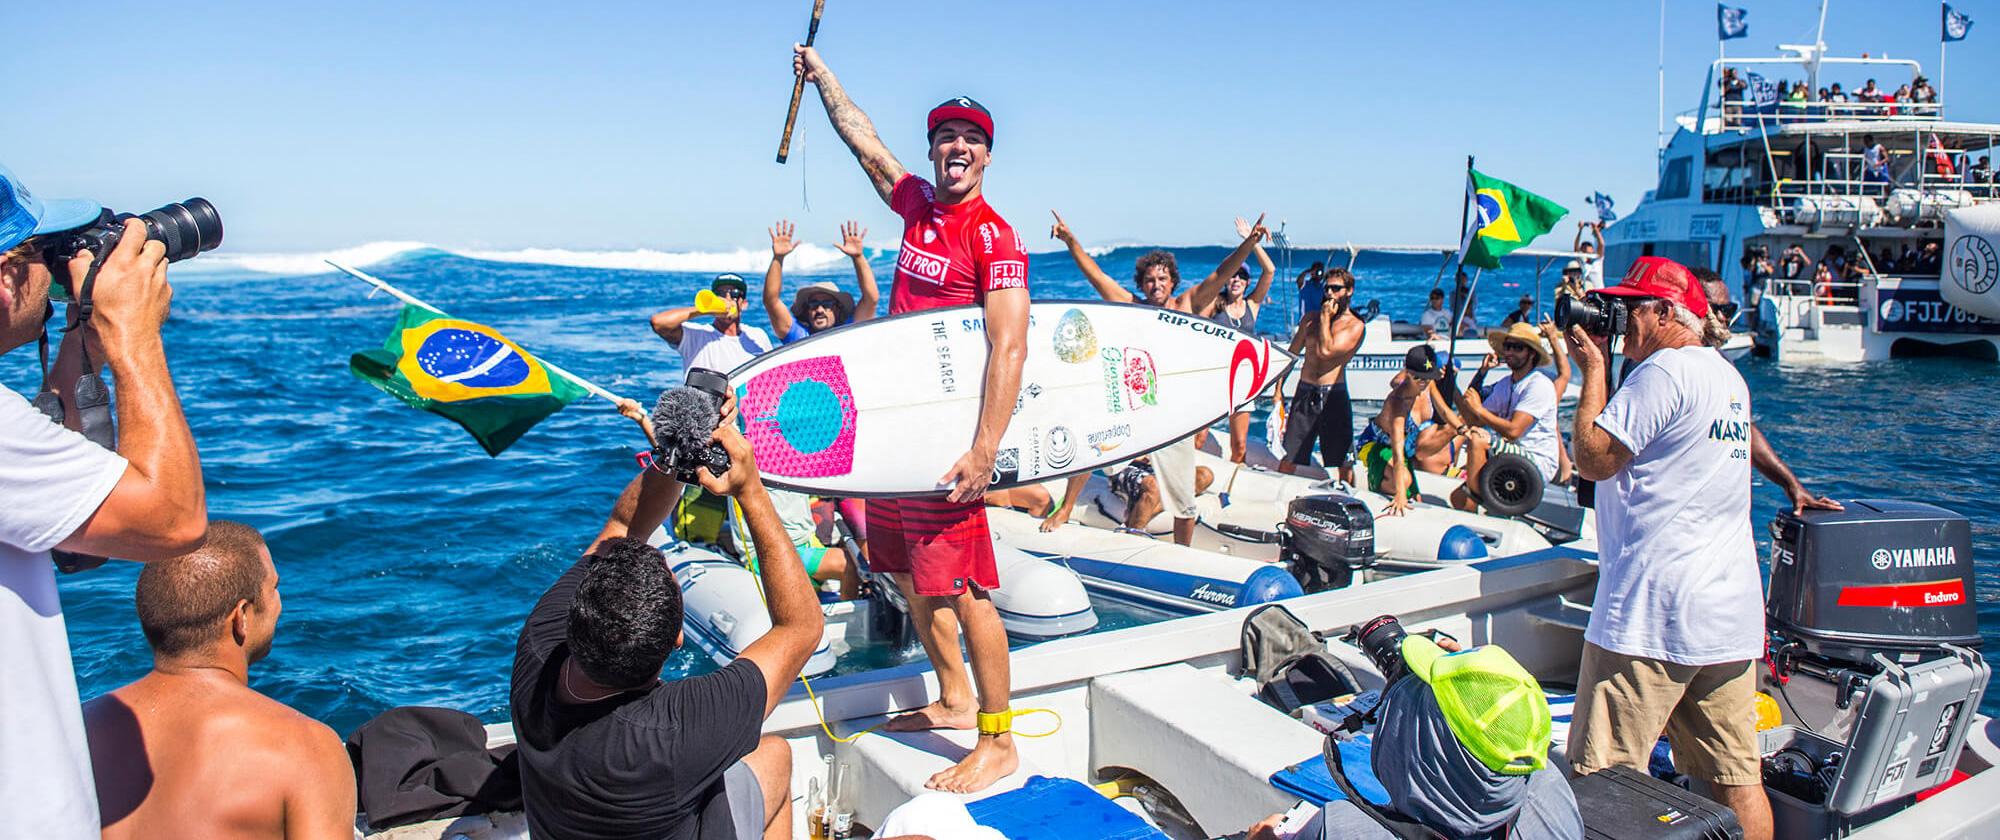 Gabriel Medina wins the Fiji Pro 2016 on a Cabianca DFK Surfboard